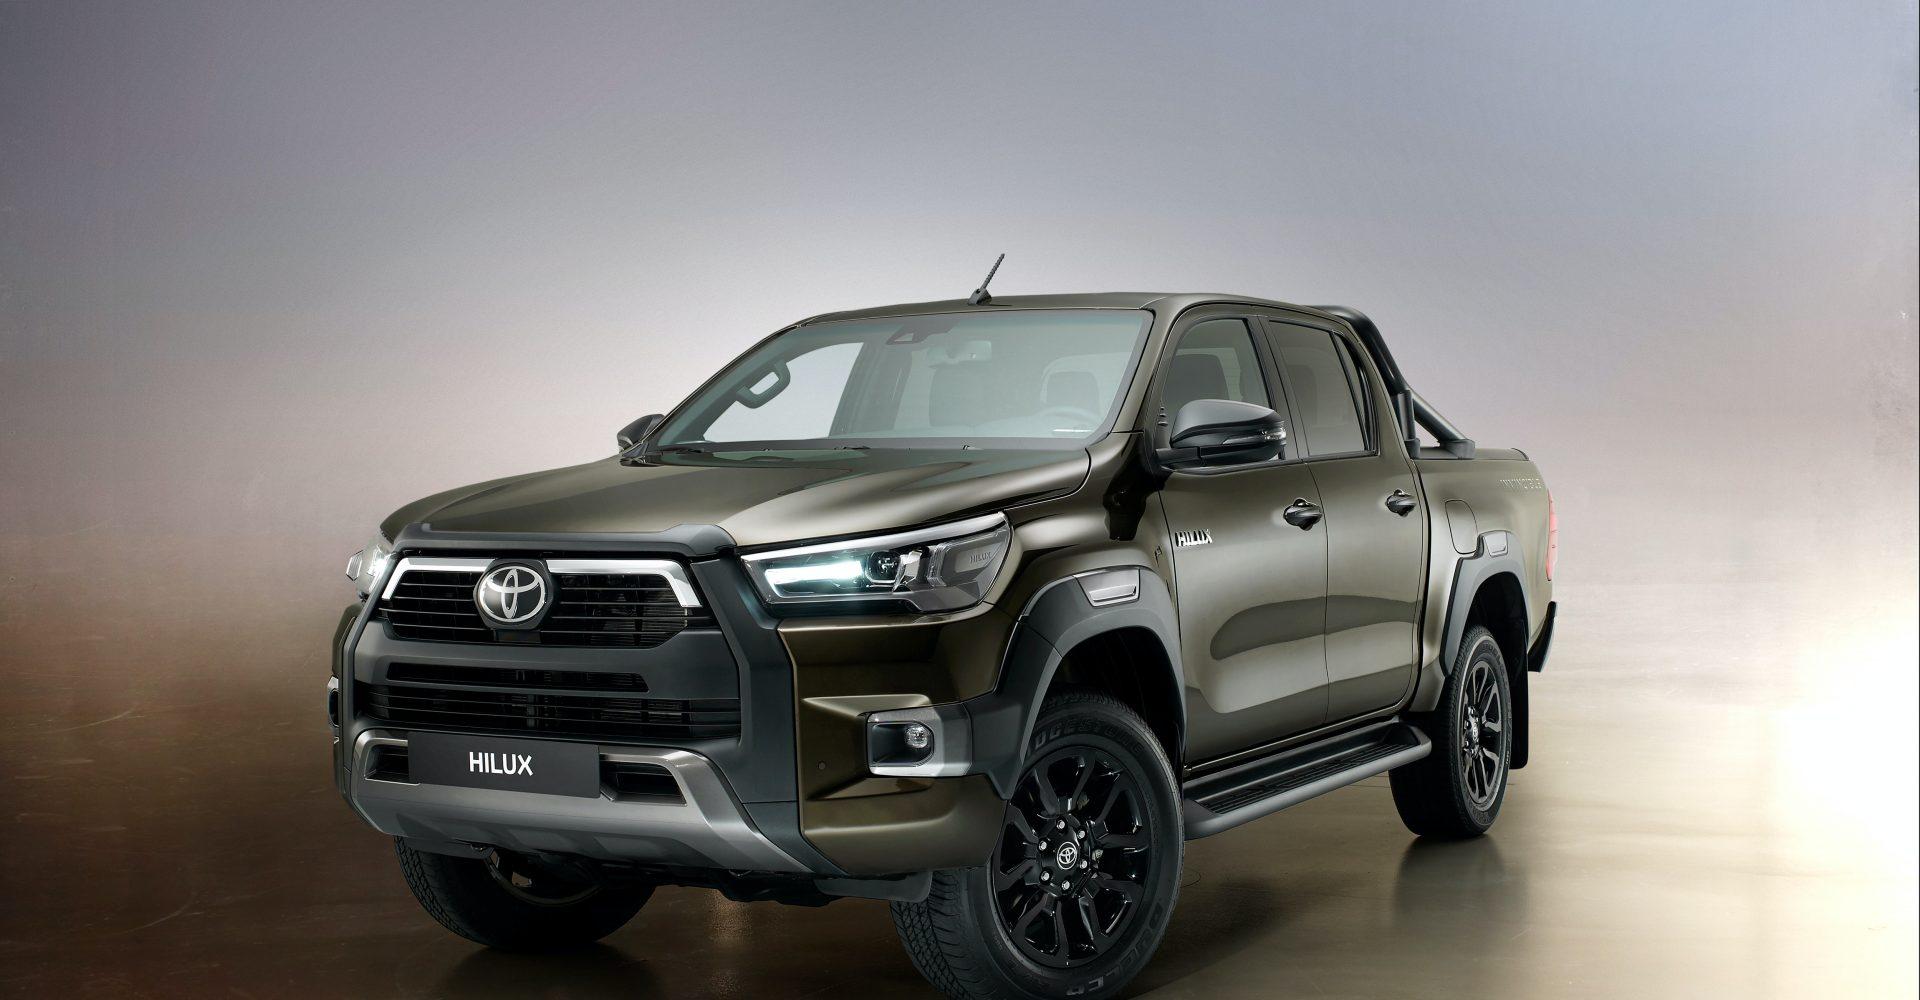 Toyota unveils new Hilux